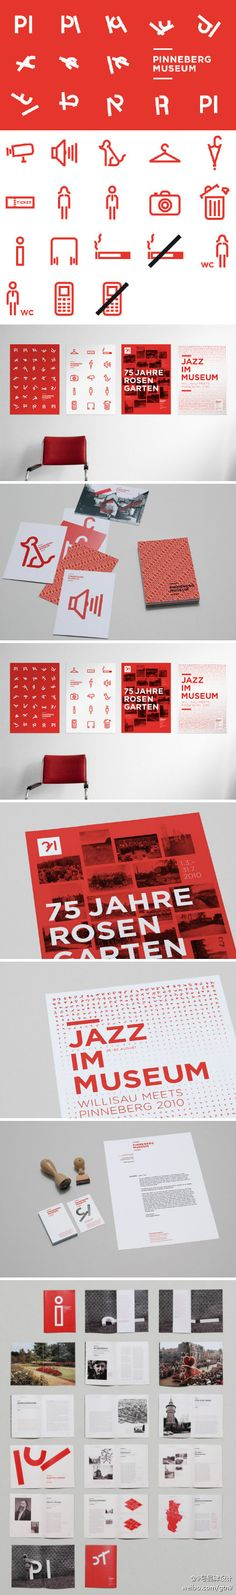 Pinneberg 博物馆视觉设计欣赏